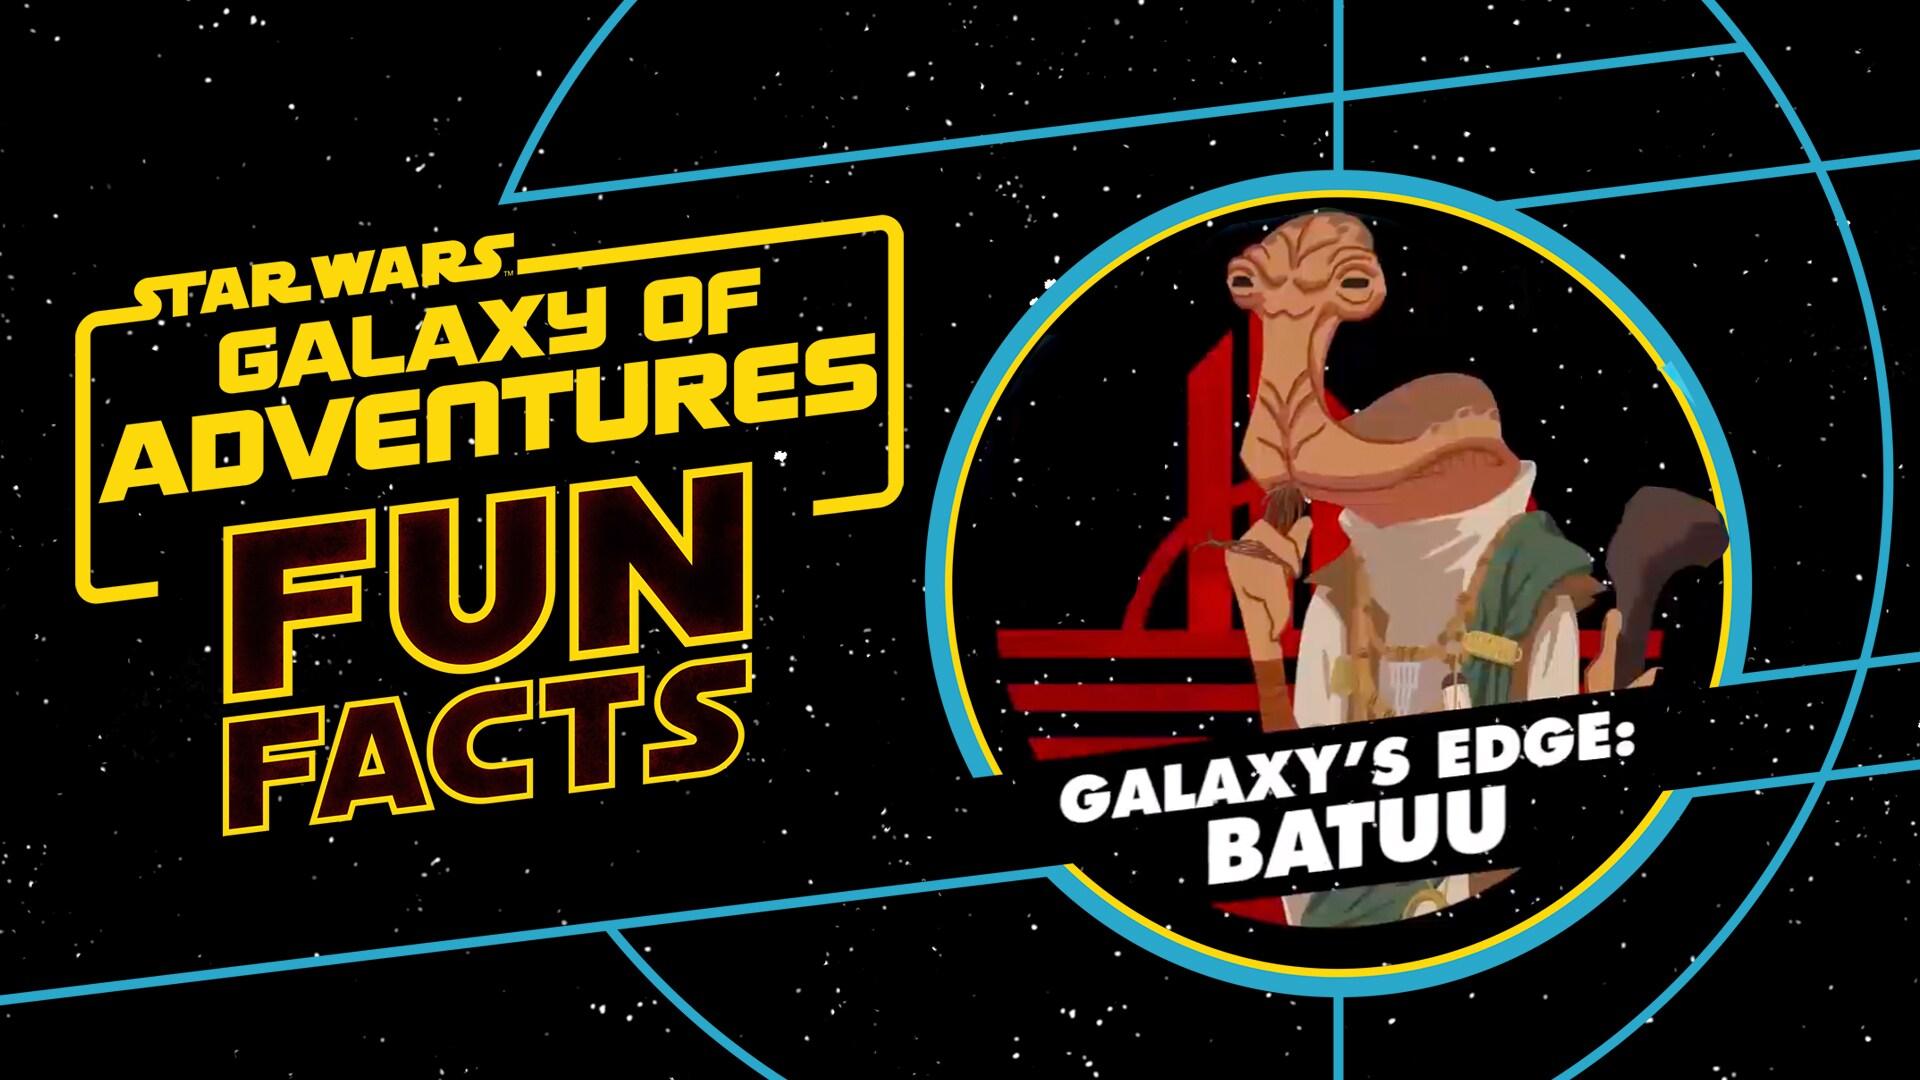 Star Wars: Galaxy's Edge - Batuu | Star Wars Galaxy of Adventures Fun Facts